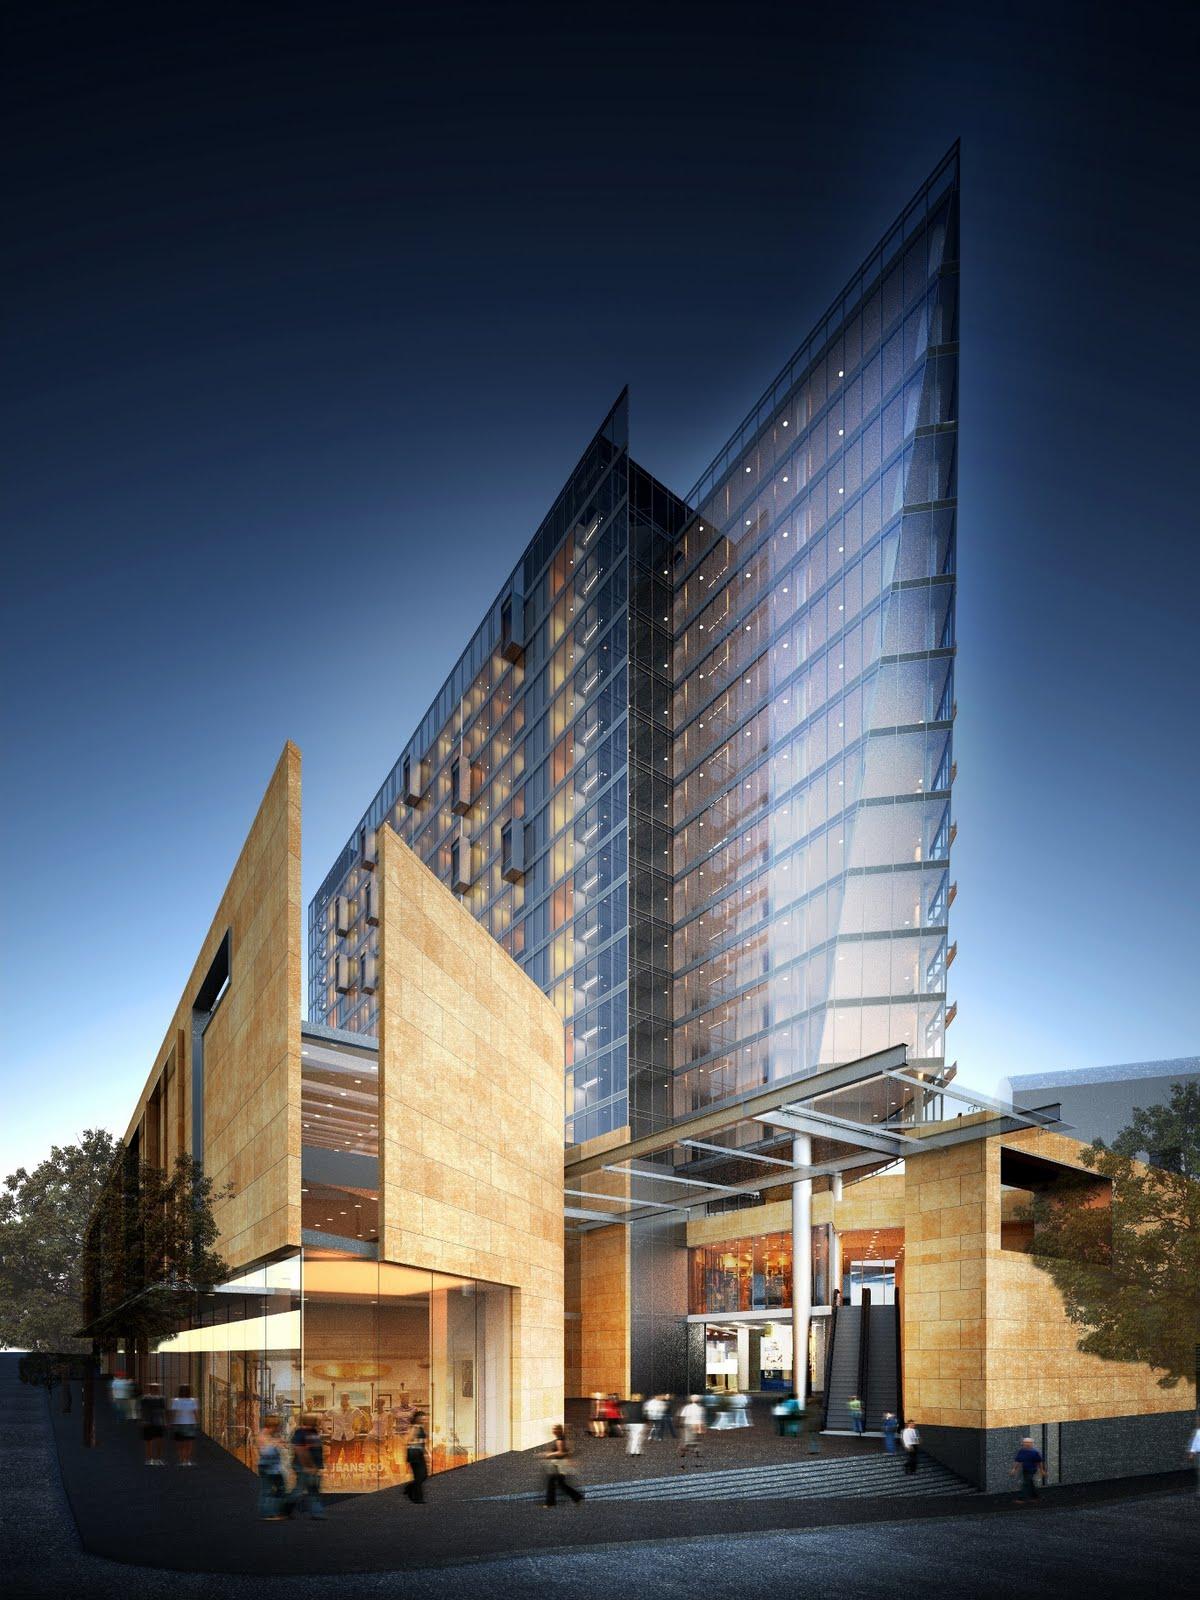 Darling Hotel Sydney Casino